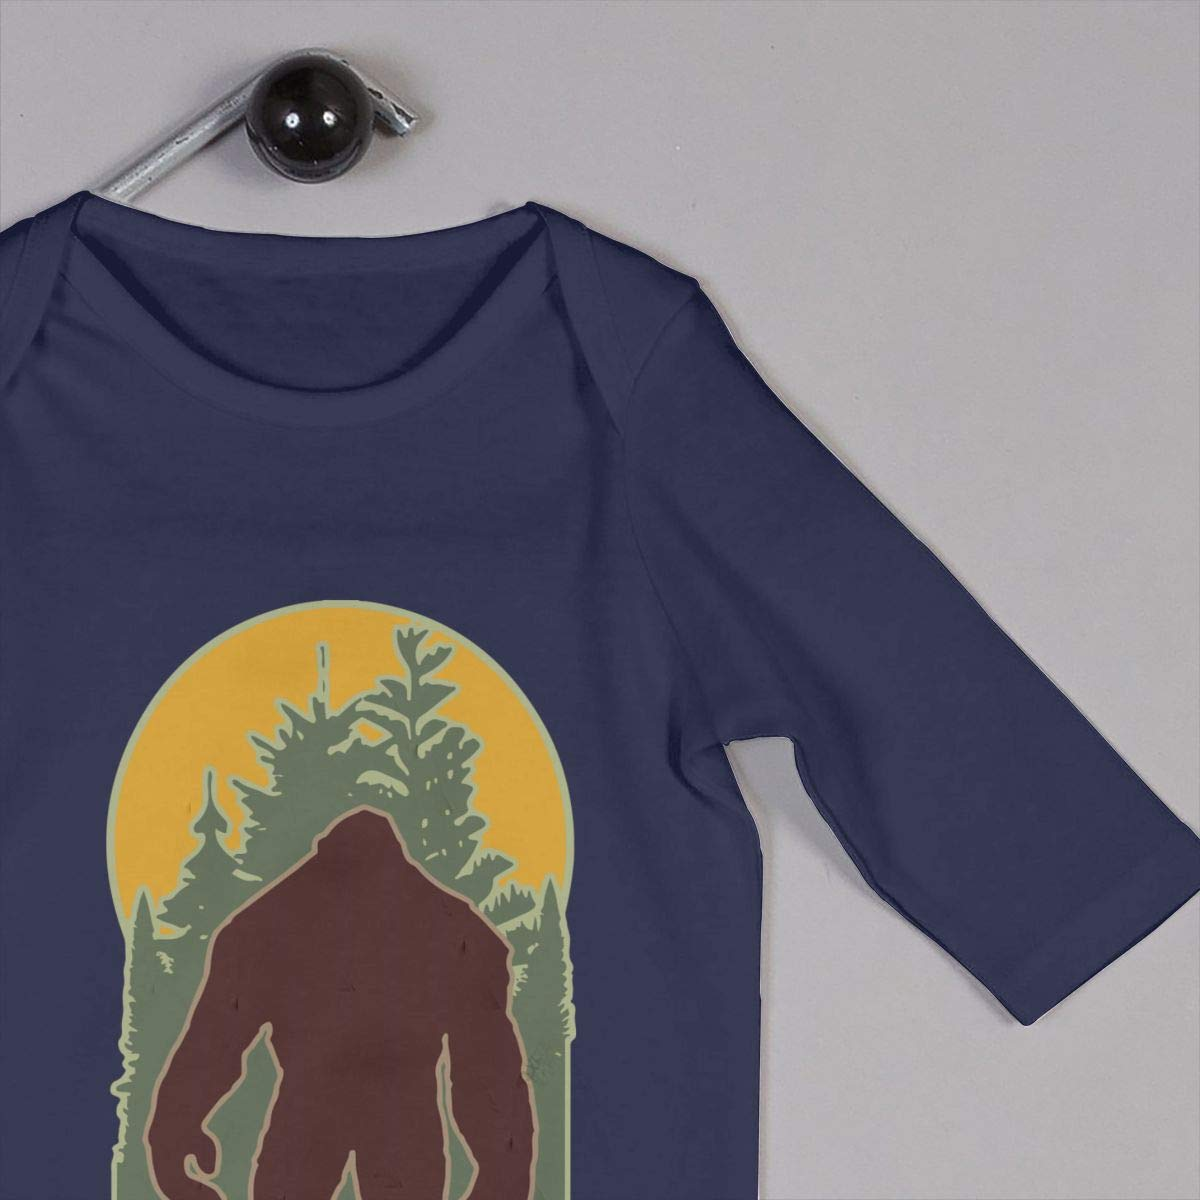 LBJQ8 Woodsy Bigfoot Newborn Kids Baby Boys Sleep and Play Bodysuit Sleepwear